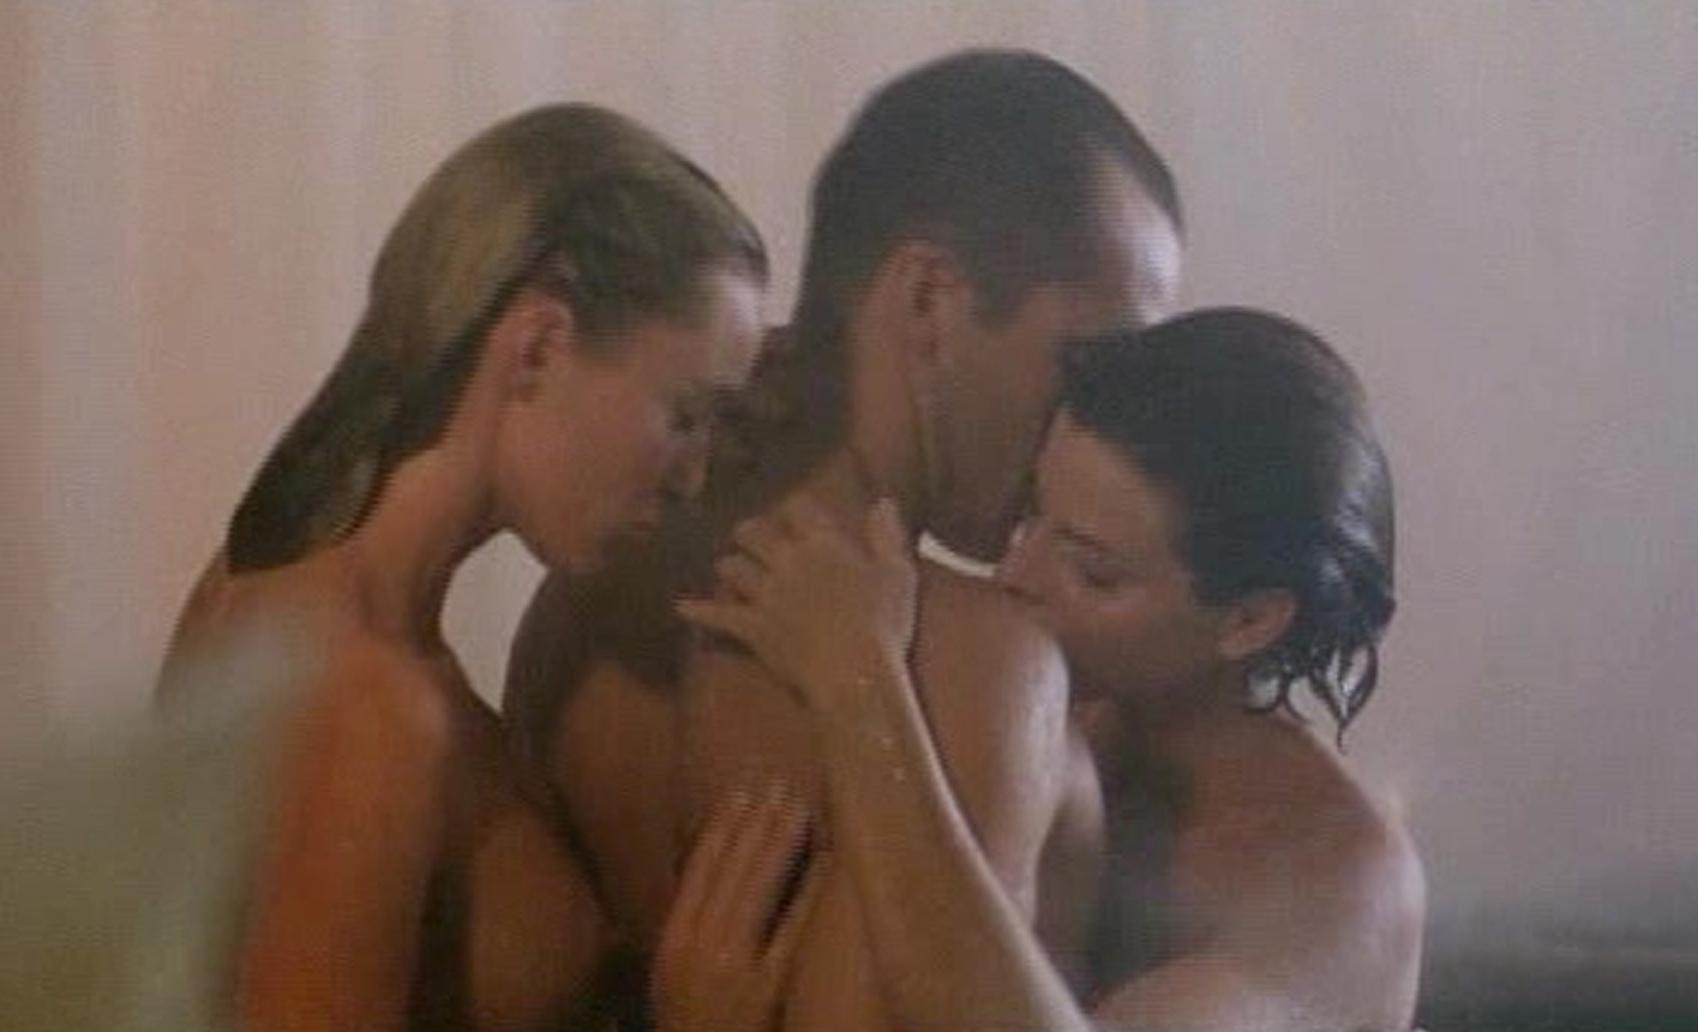 Joan Severance Sex Movies joan severance best nude movies - new porn